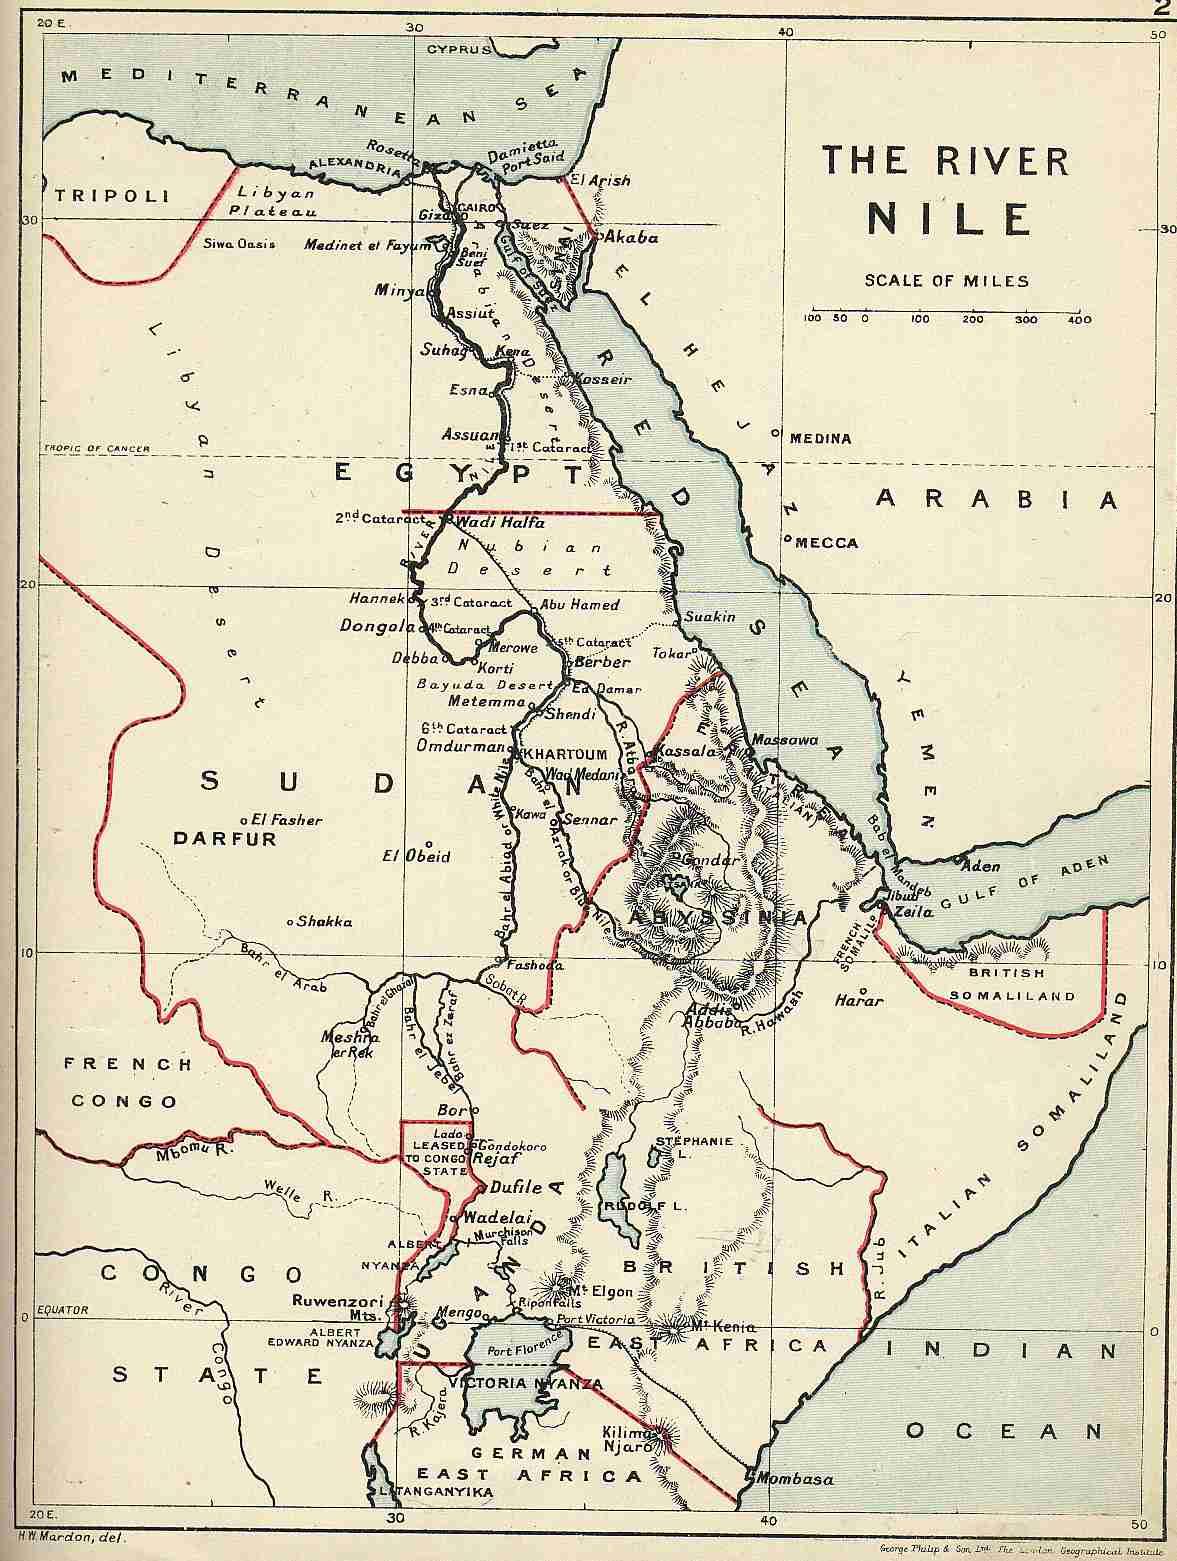 Life of a Diplomat: Bridge Over River Nile